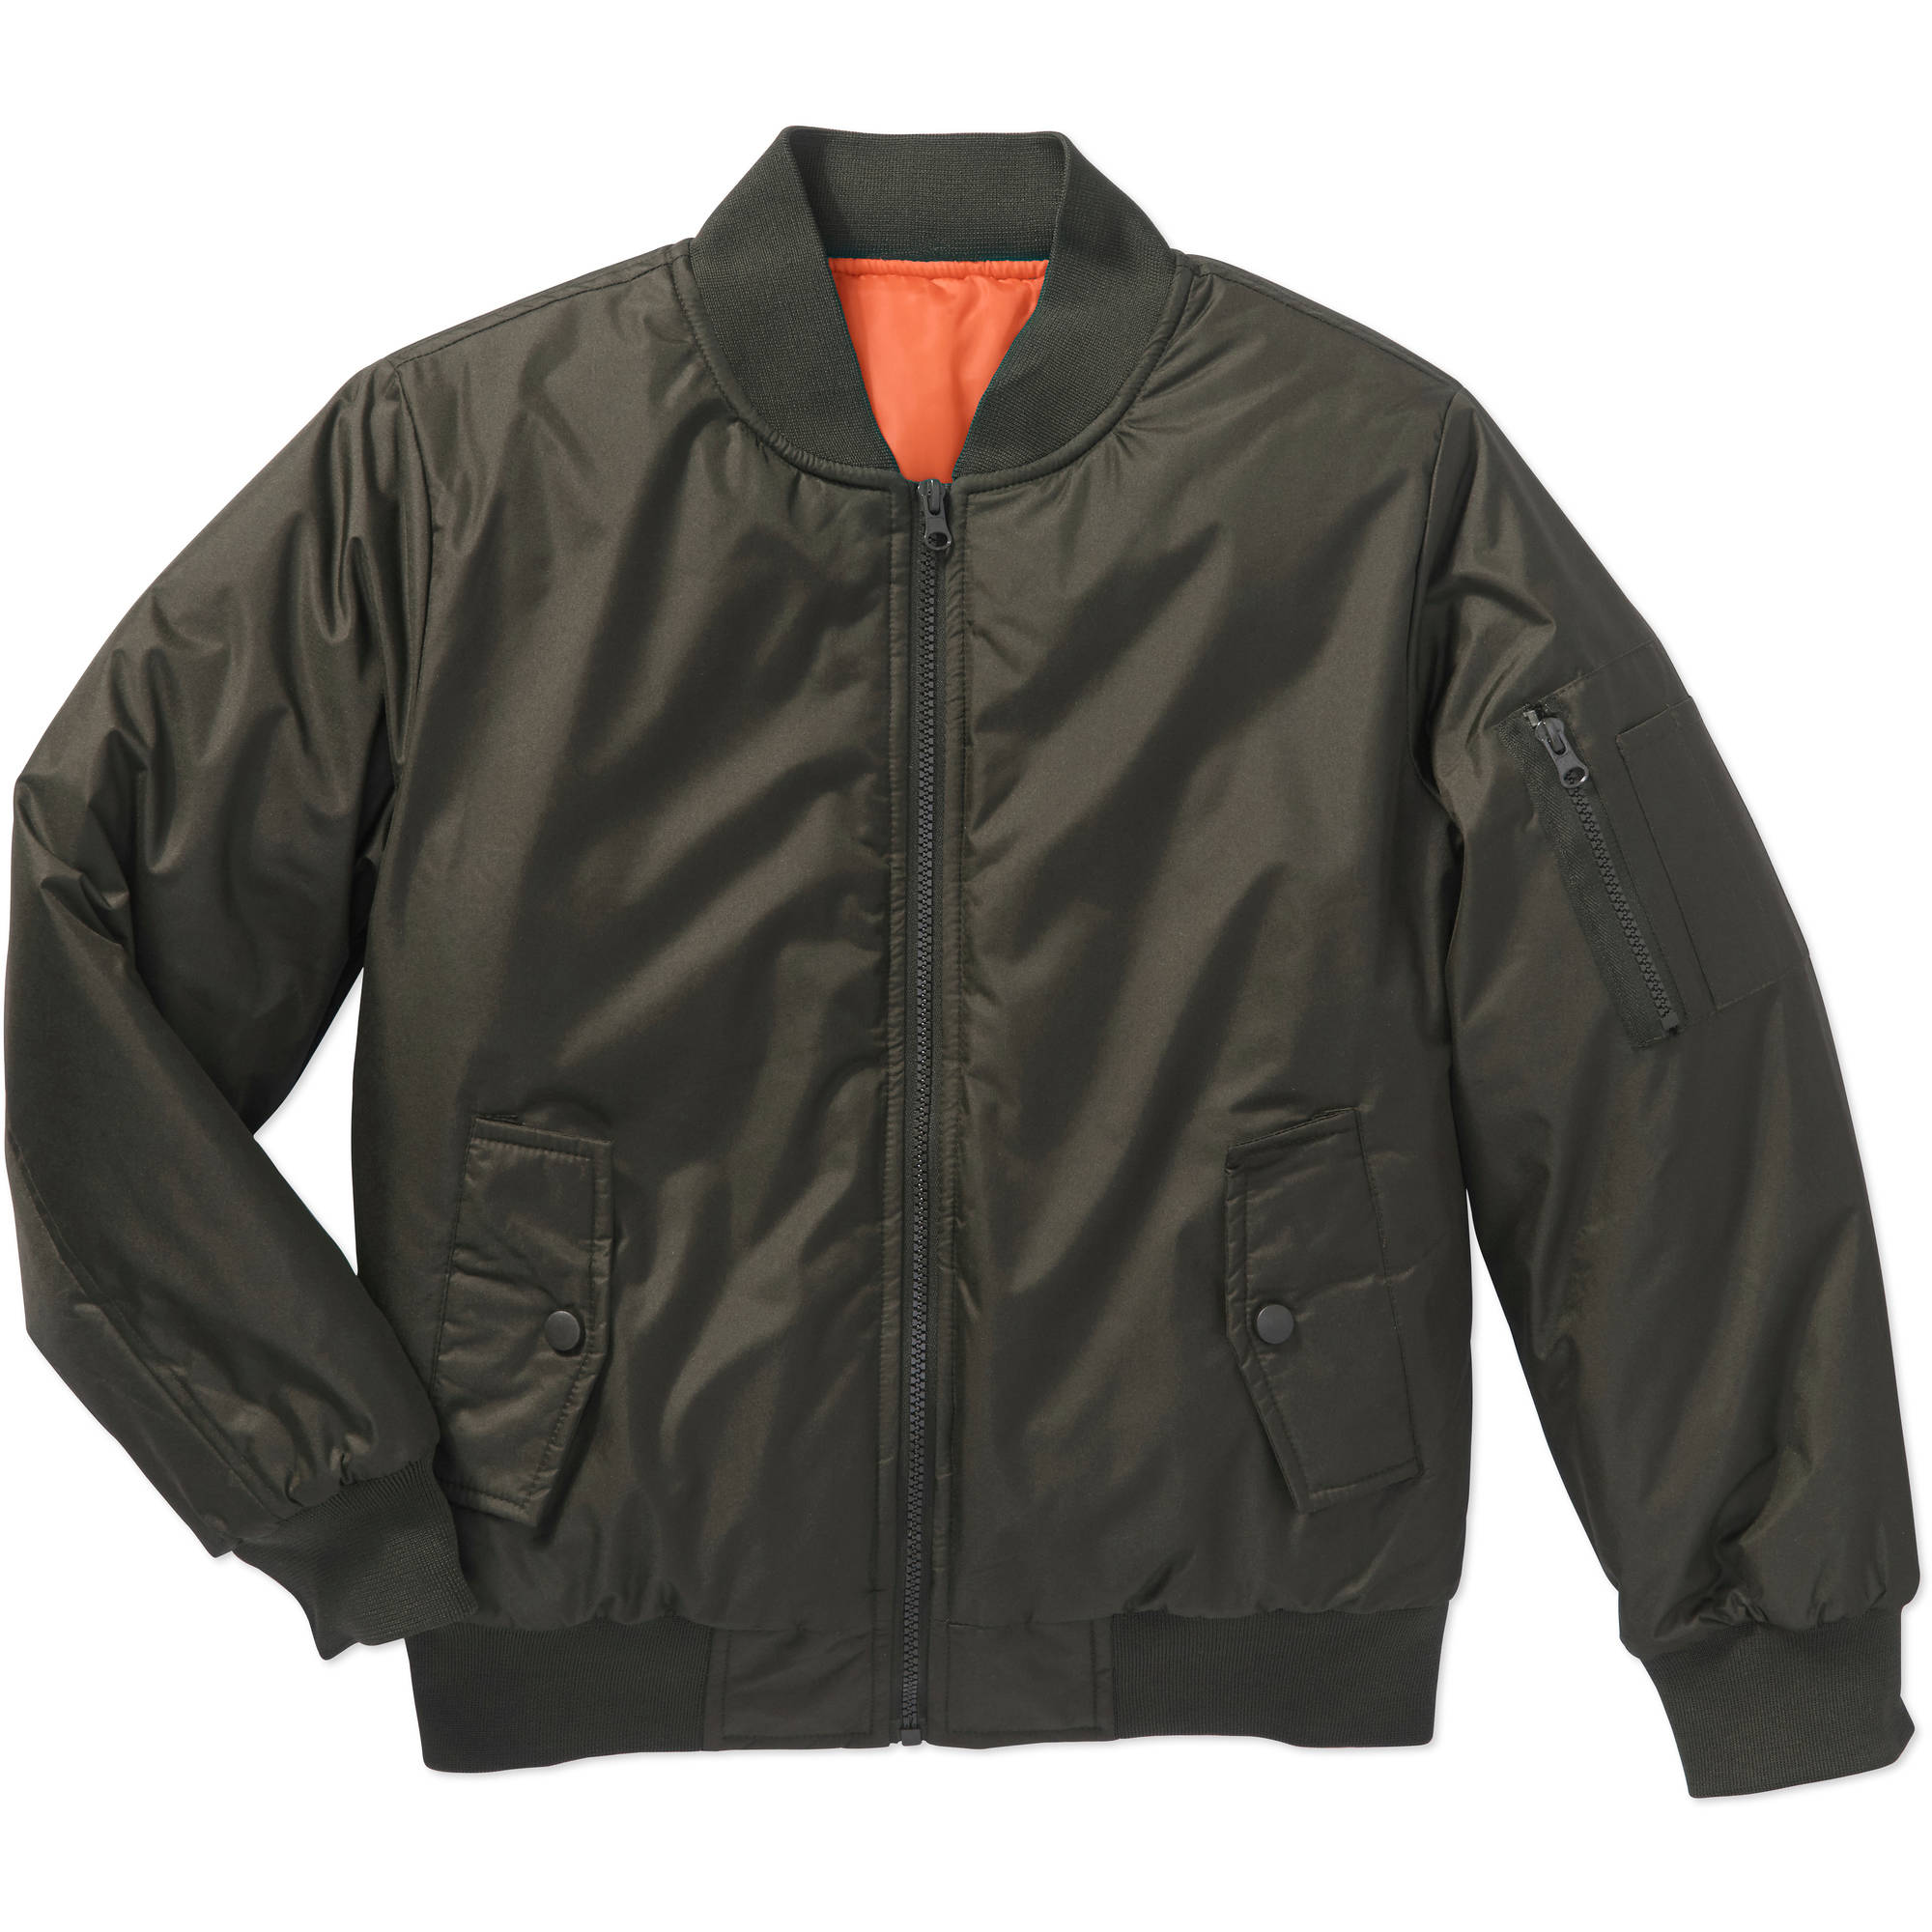 Bocini Boys' Bomber Jacket - Walmart.com